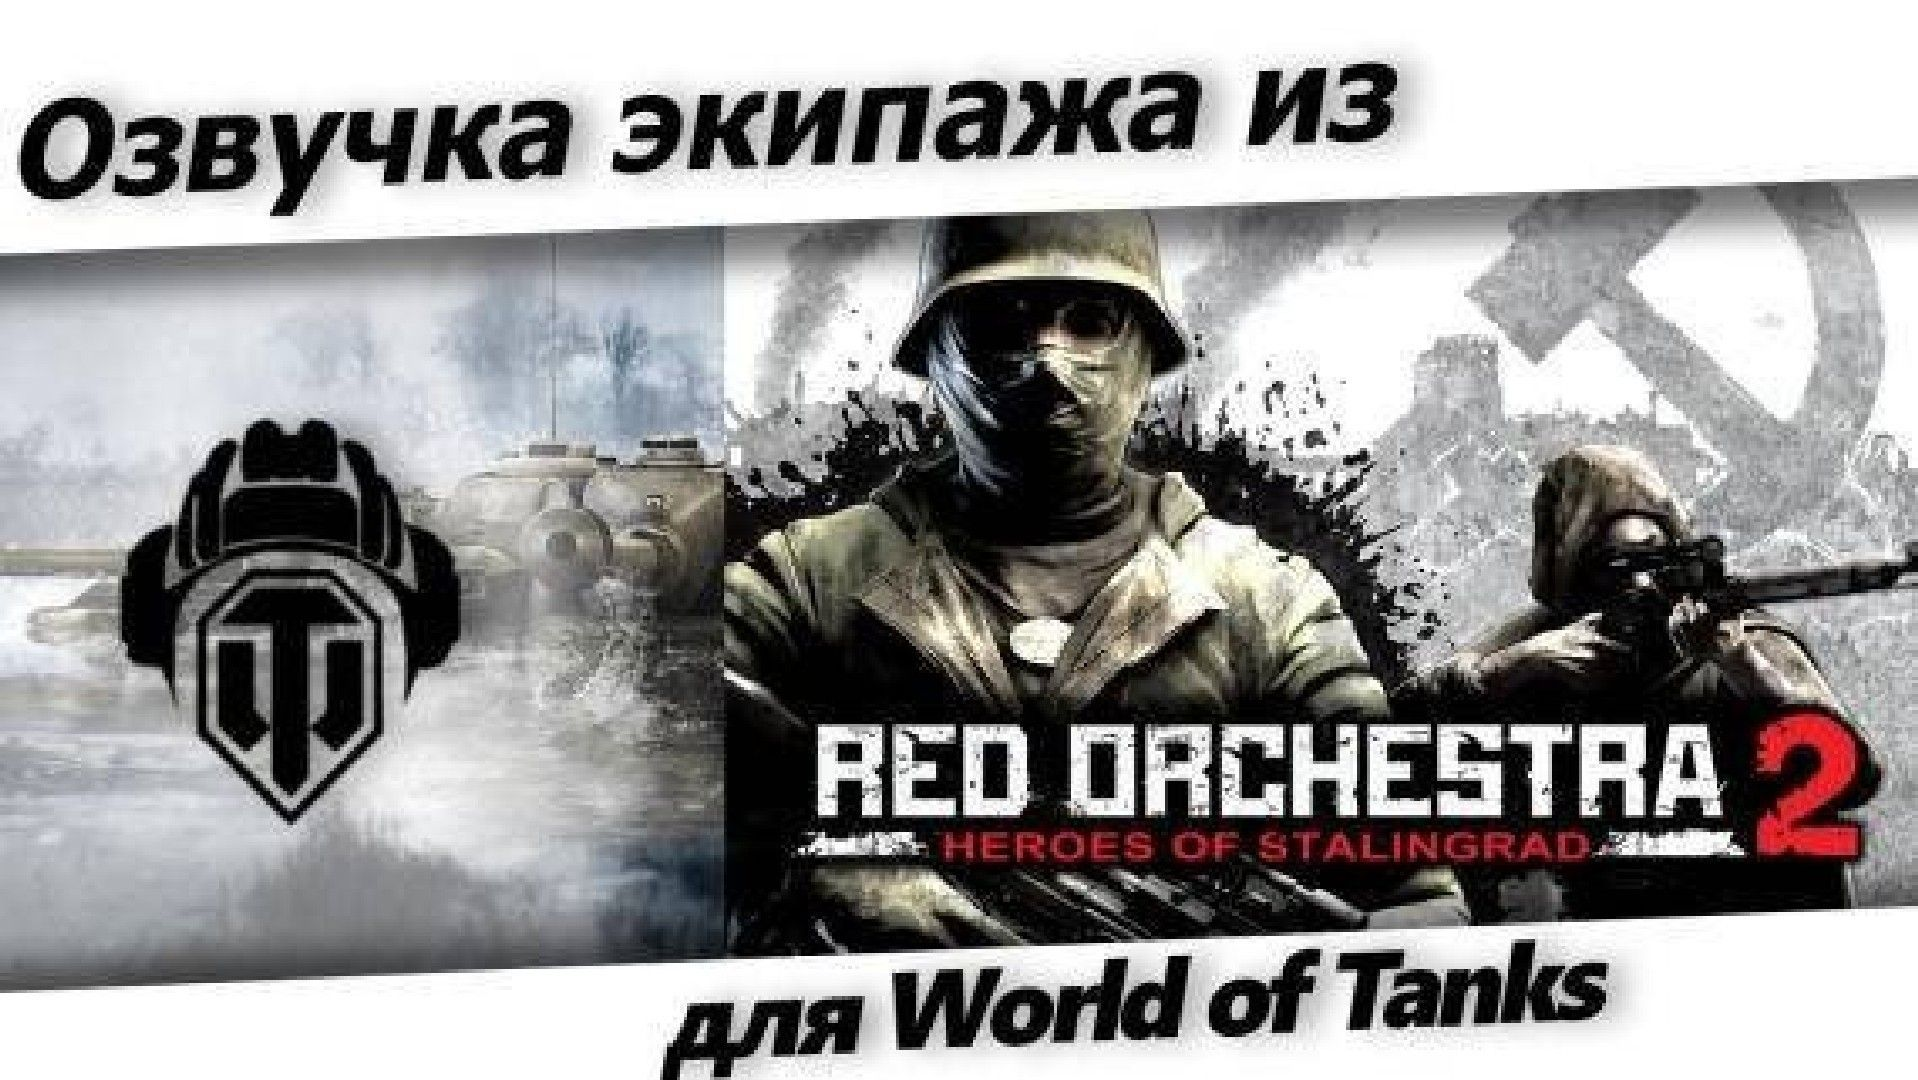 скачать немецкую озвучку для world of tanks Red Orchestra